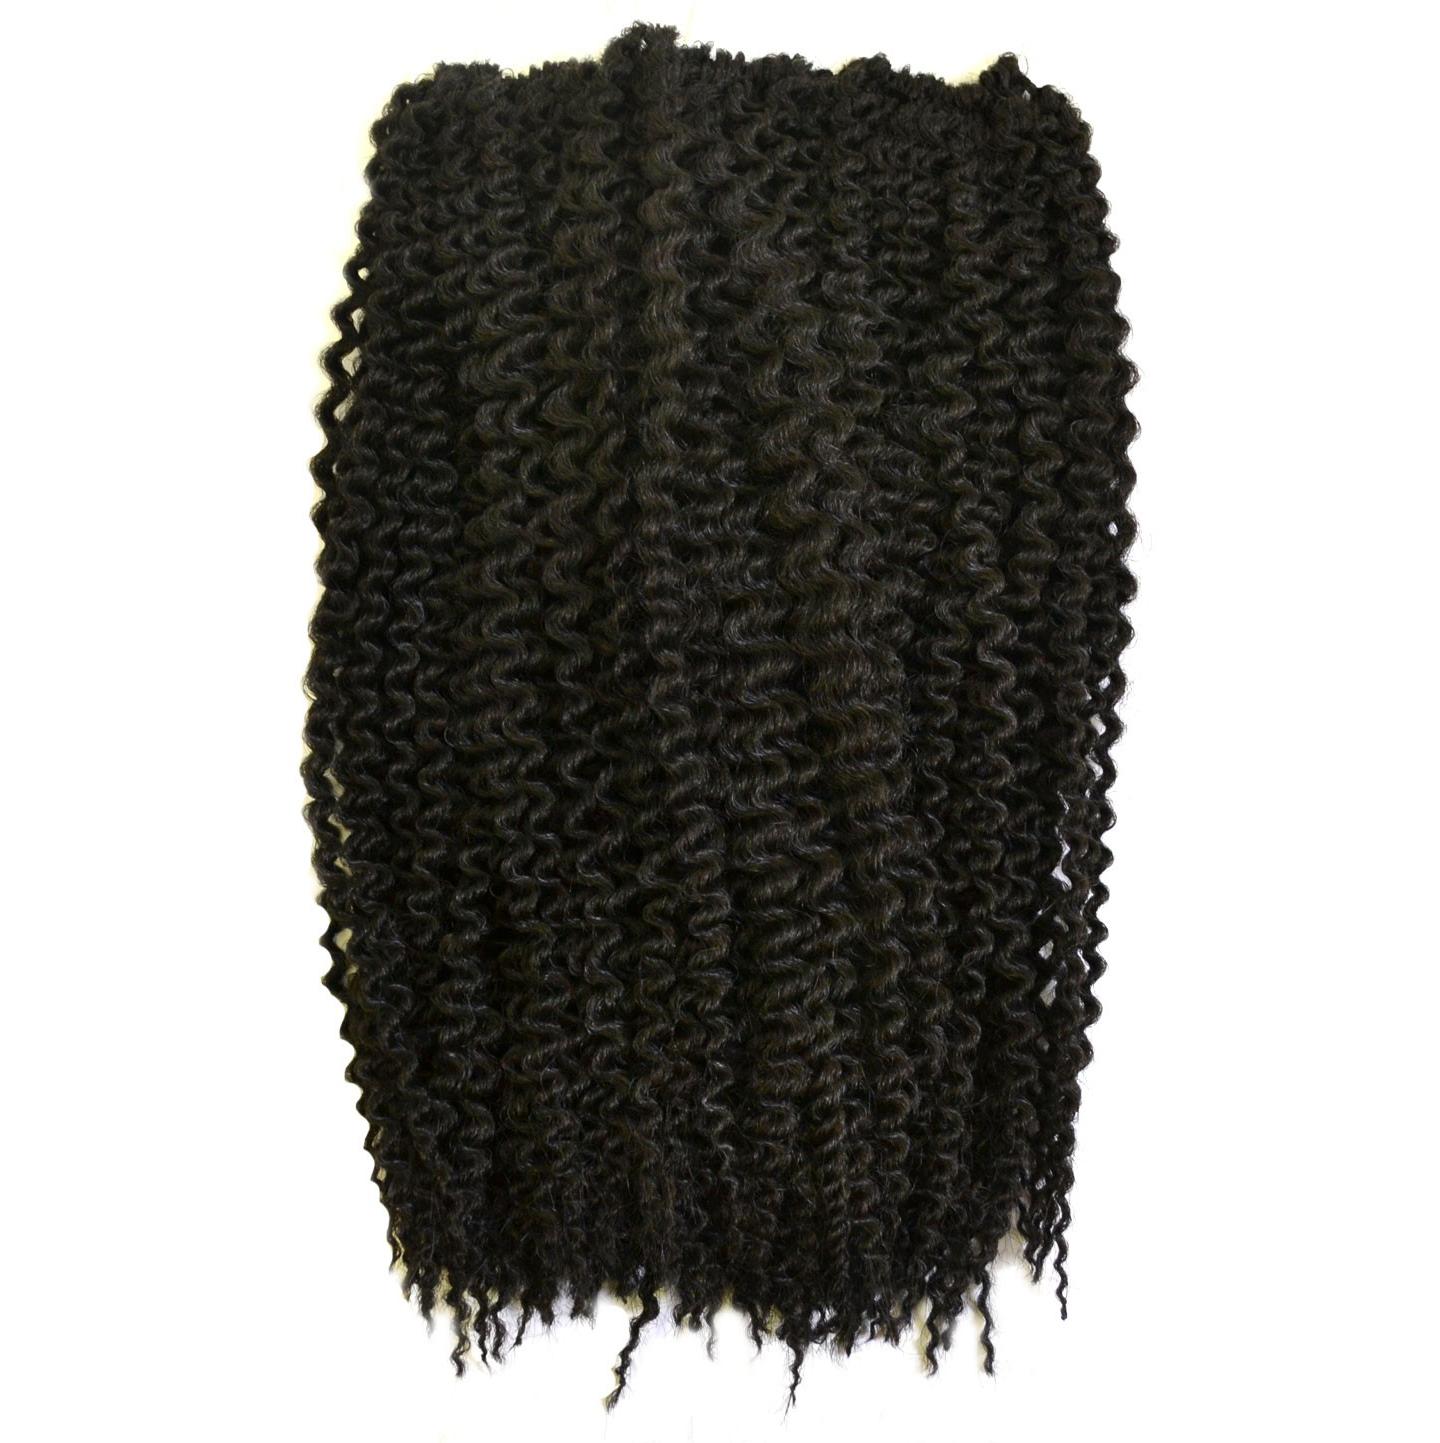 Crochet Hair Pre Loop : Copyright ? 1995-2017 eBay Inc. Alle Rechte vorbehalten. eBay-AGB ...